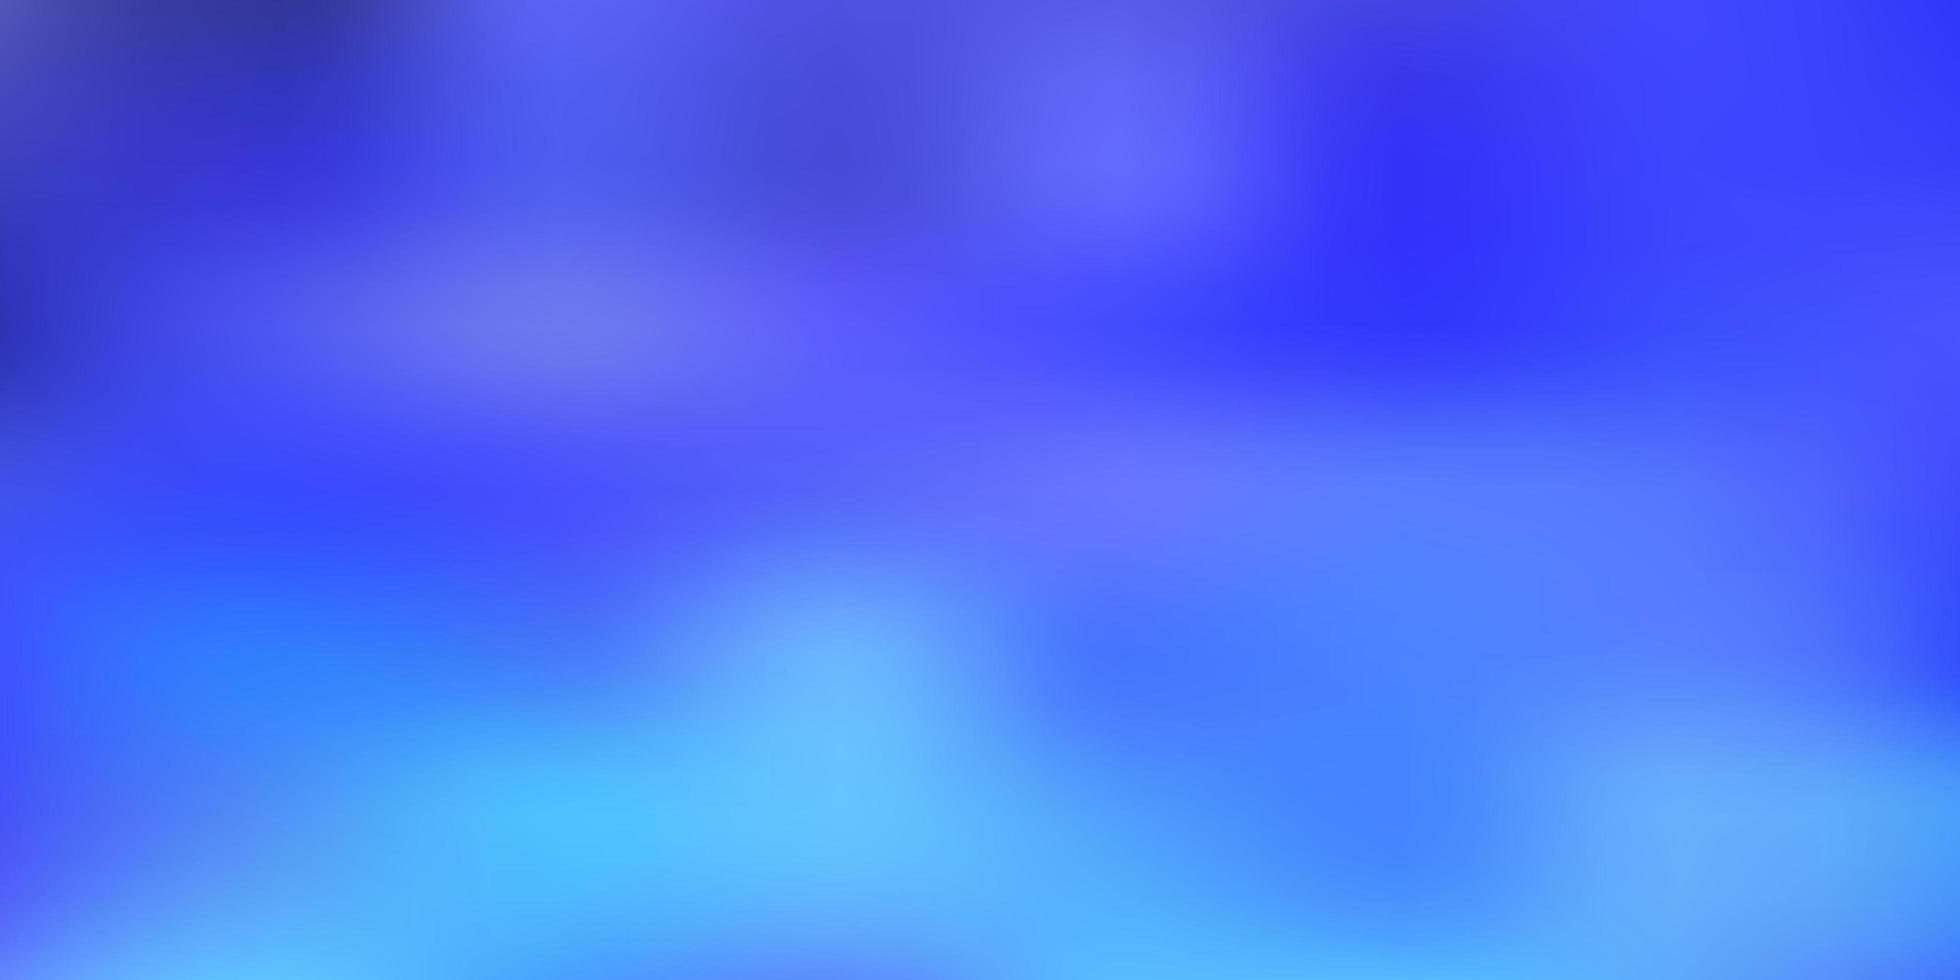 sfondo sfocato sfumato vettoriale blu chiaro.